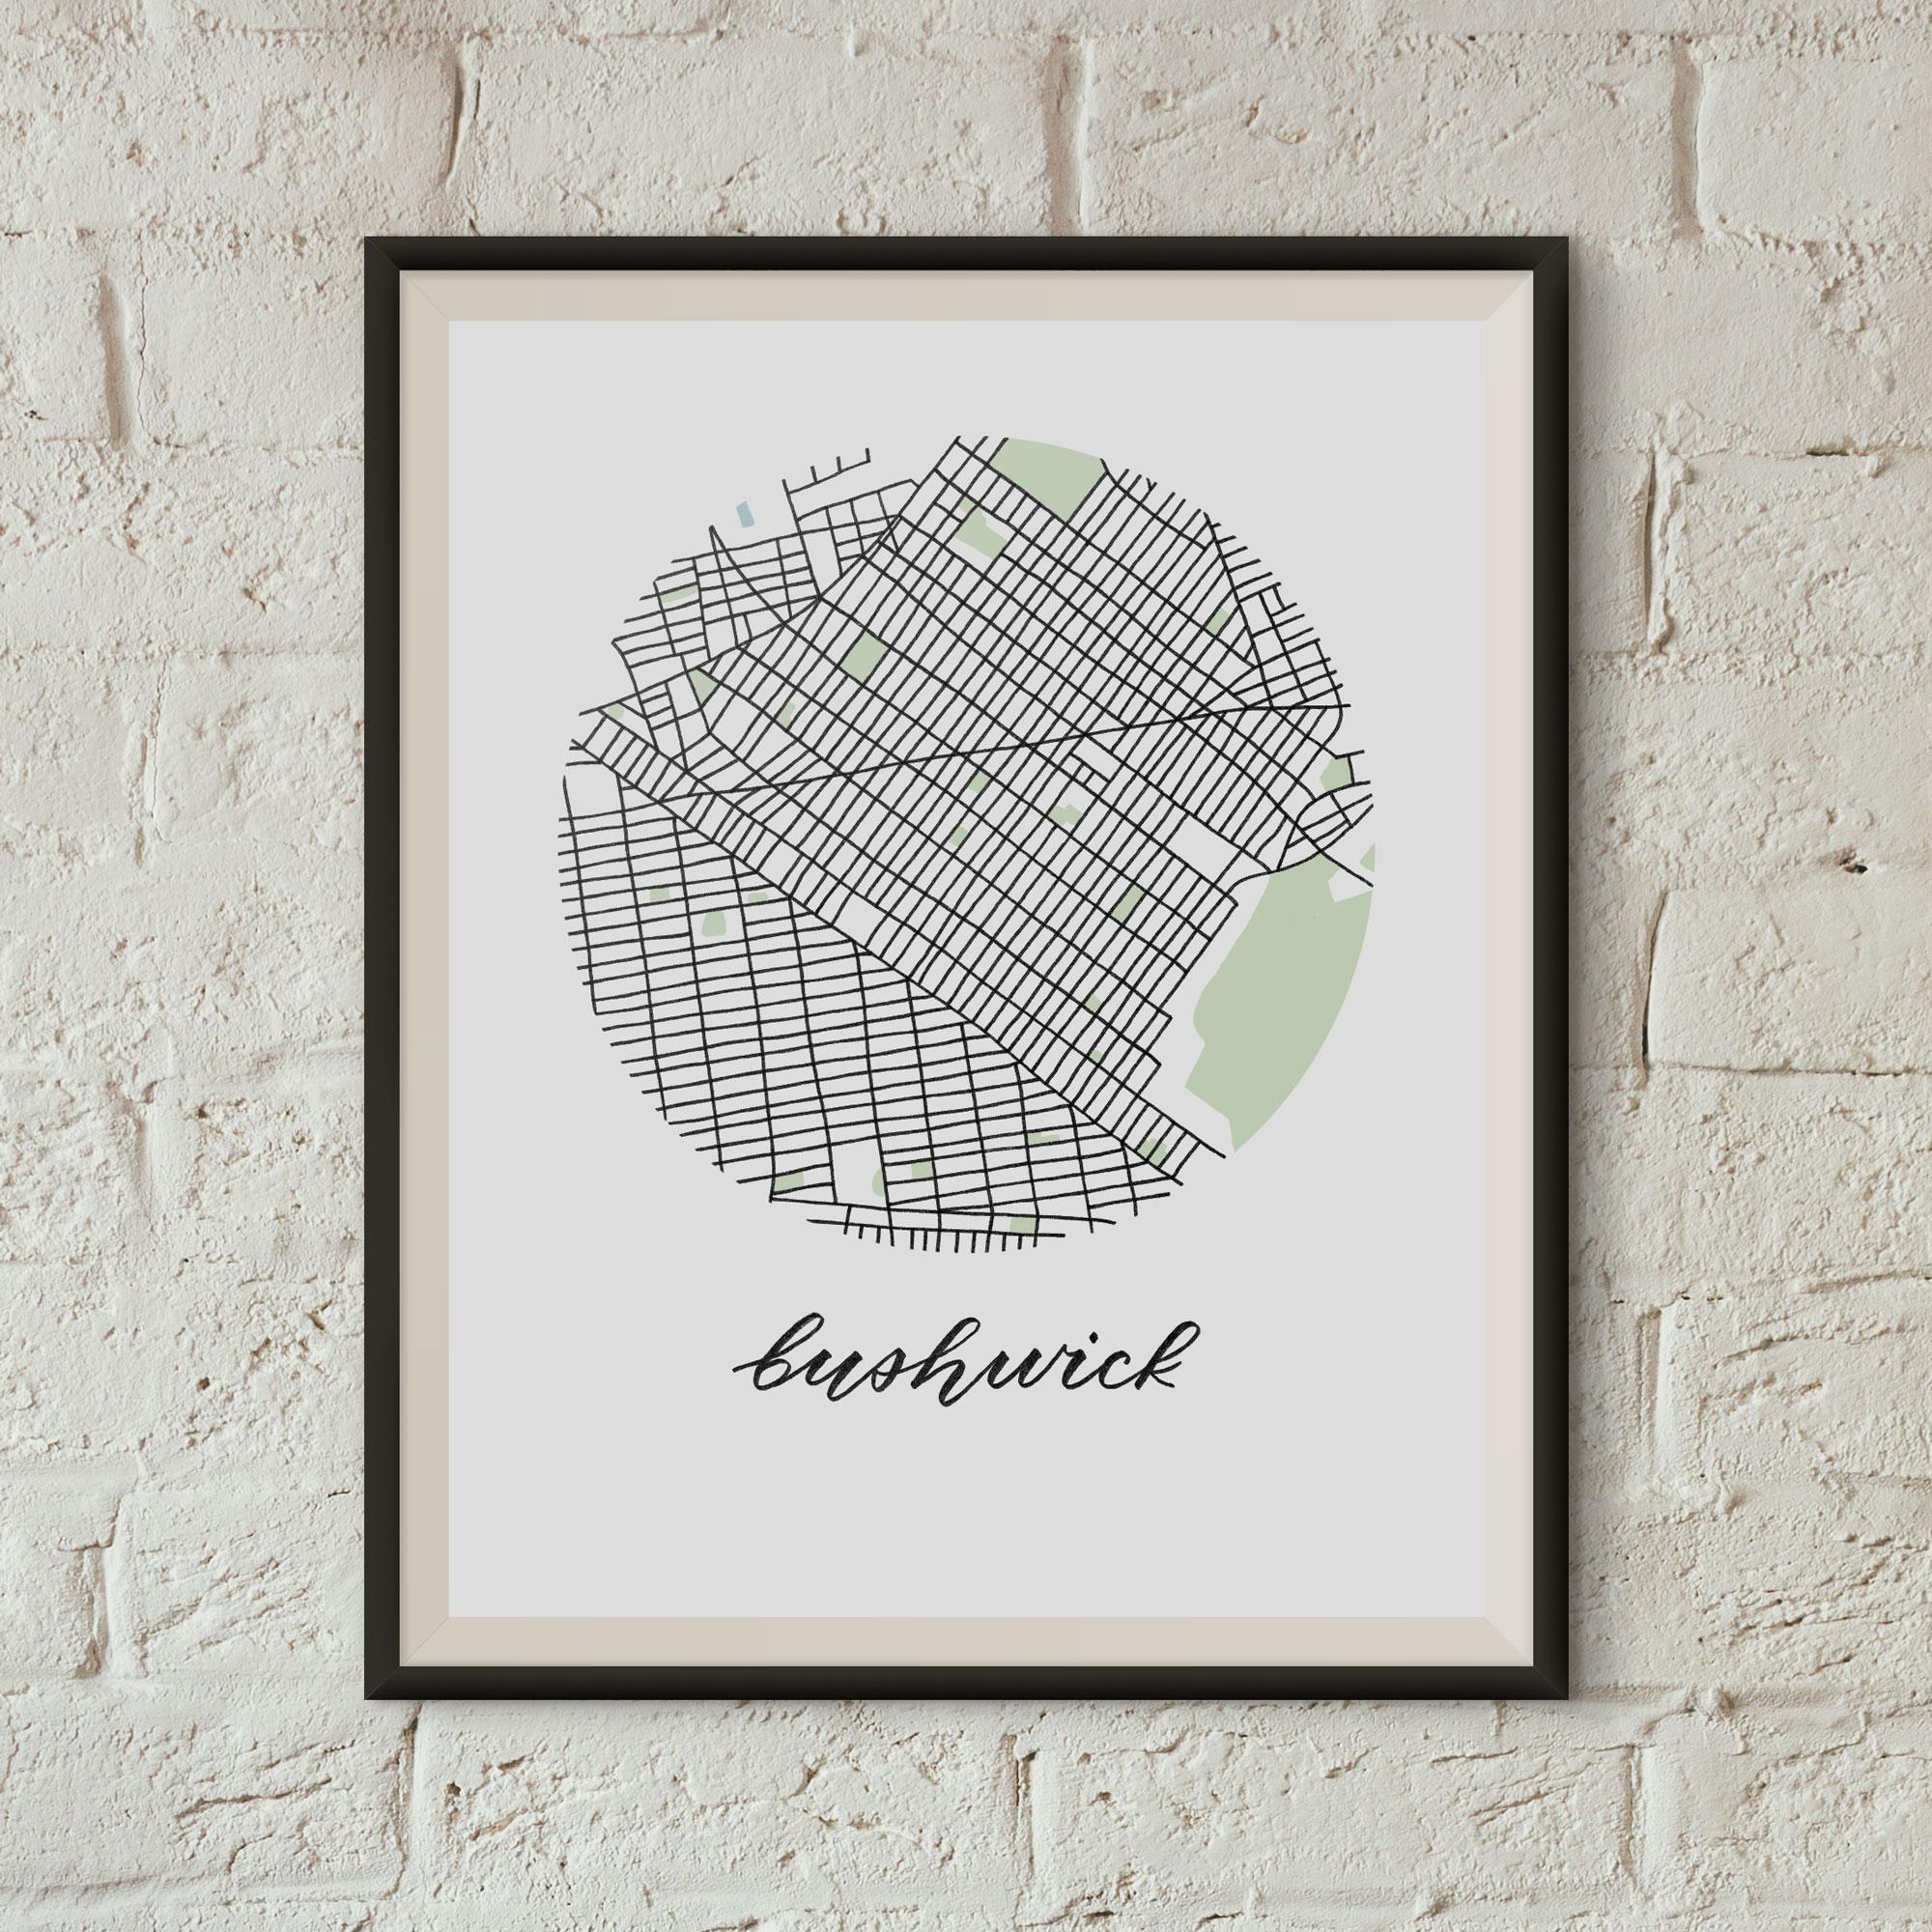 Bushwick, Brooklyn Map Print framed on a white brick wall